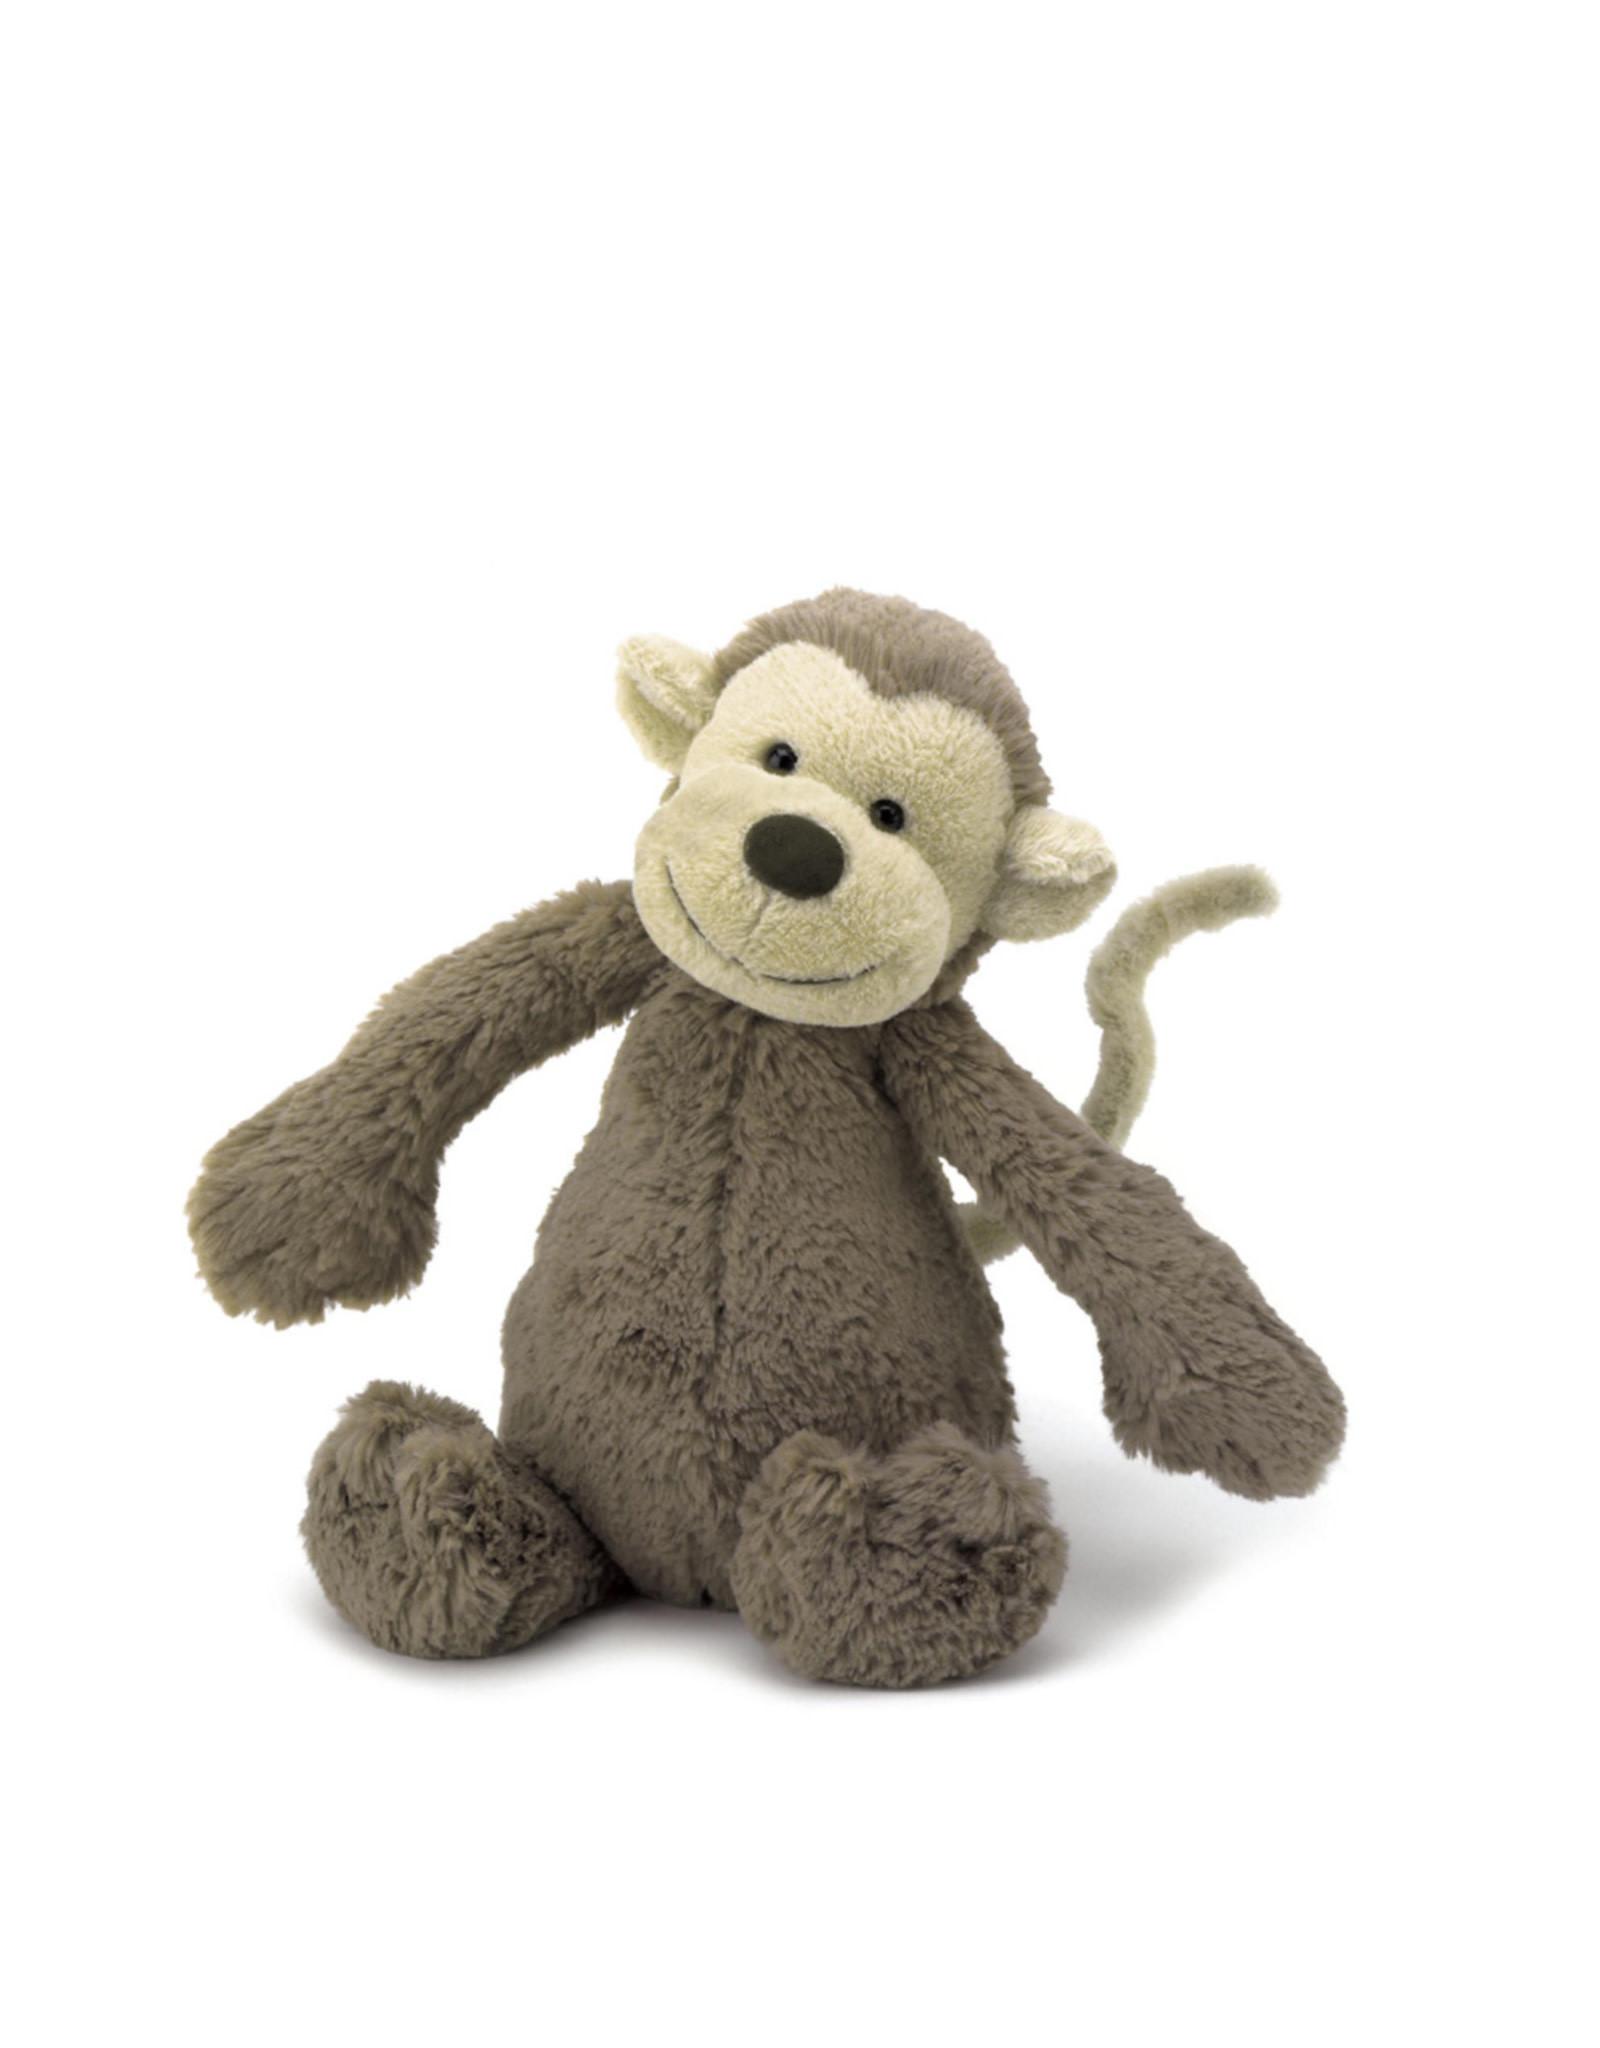 Jelly Cat Stuffed animal - Medium Monkey